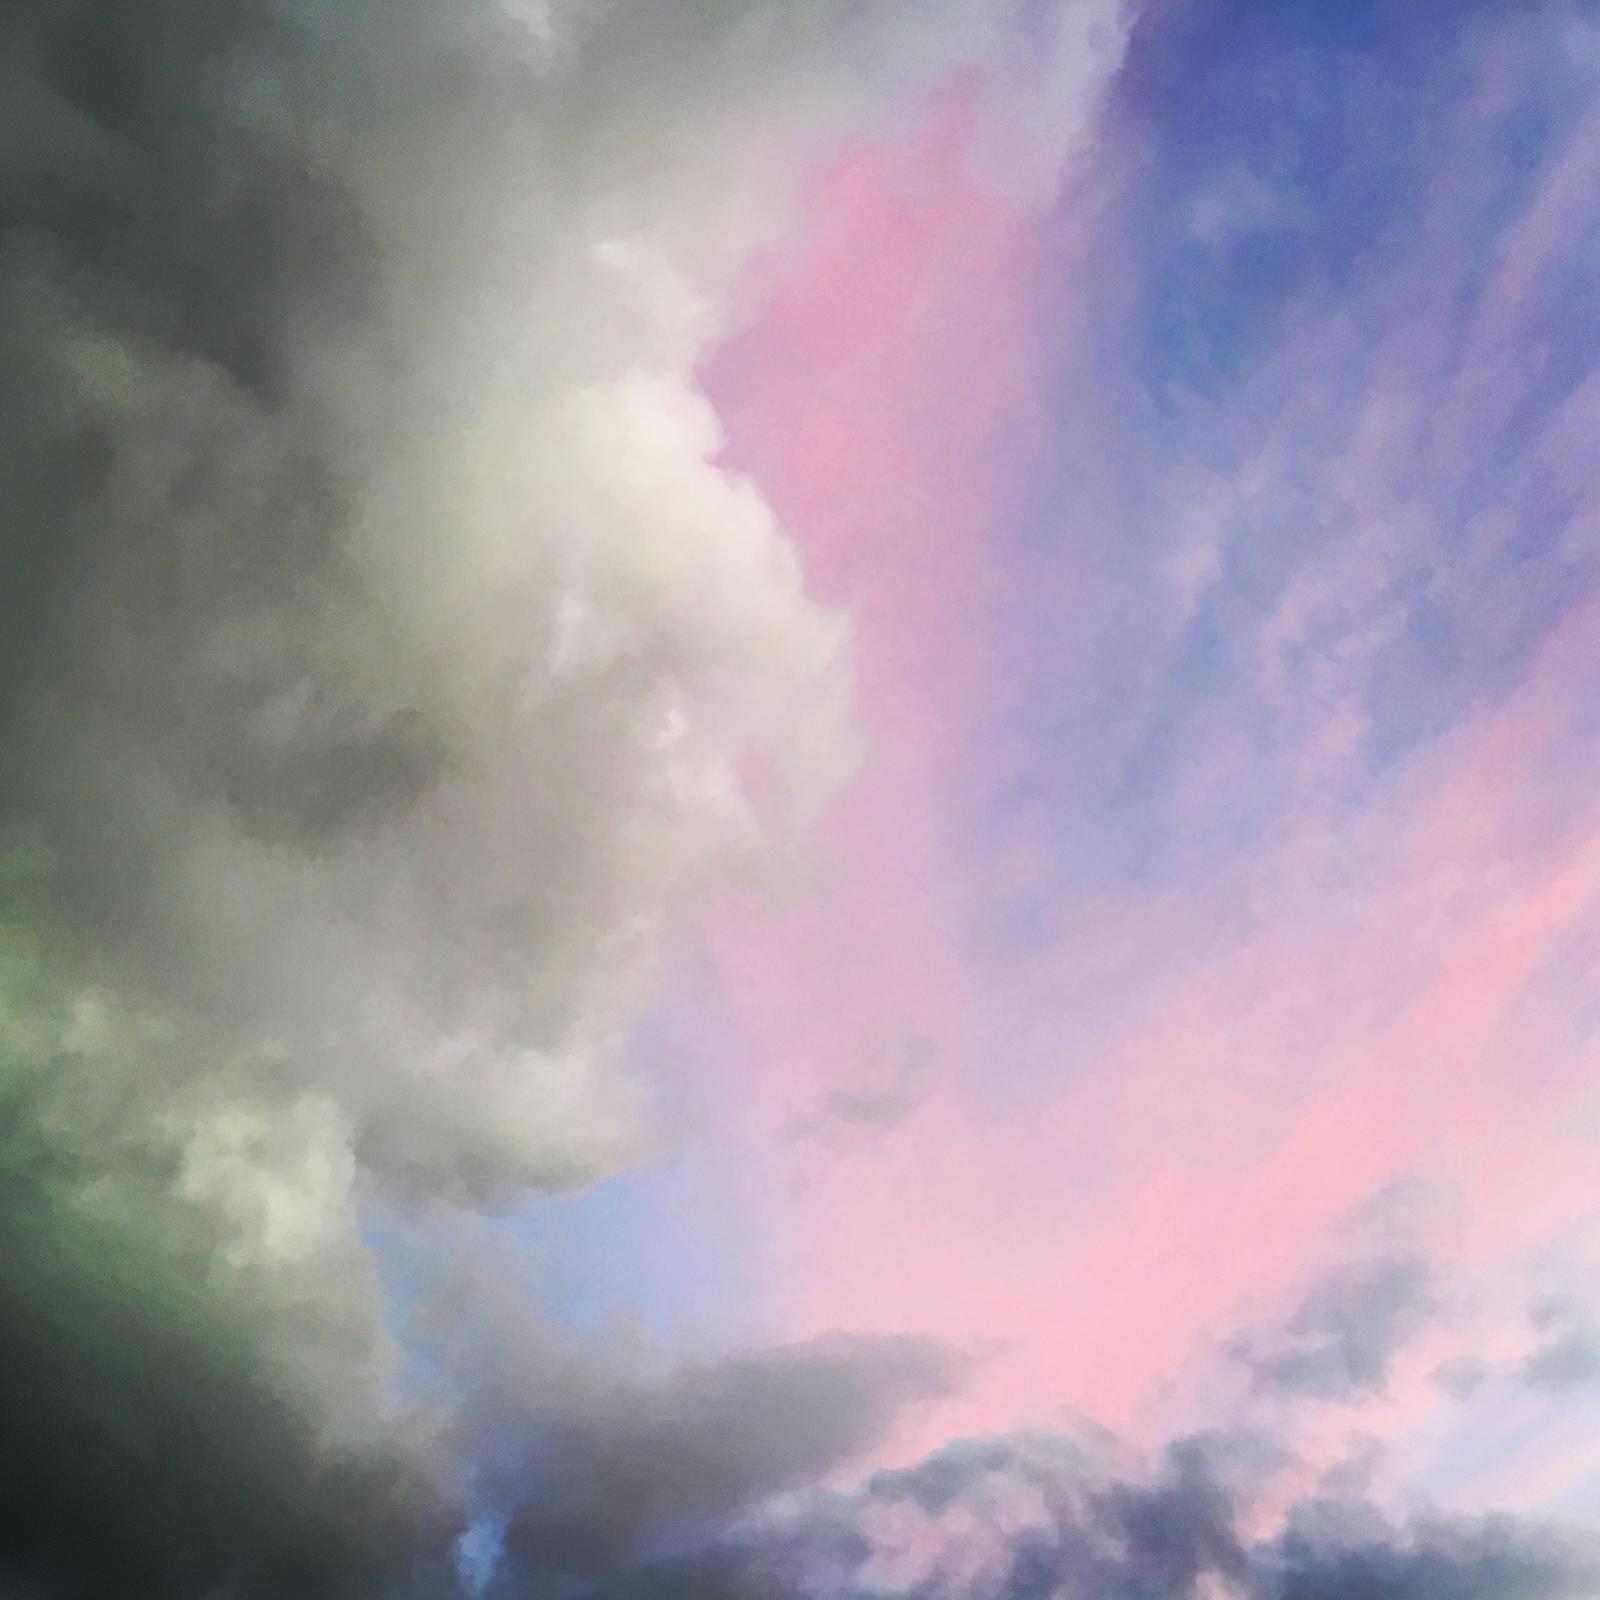 Sunset-lit clouds over Harold's Cross, Dublin